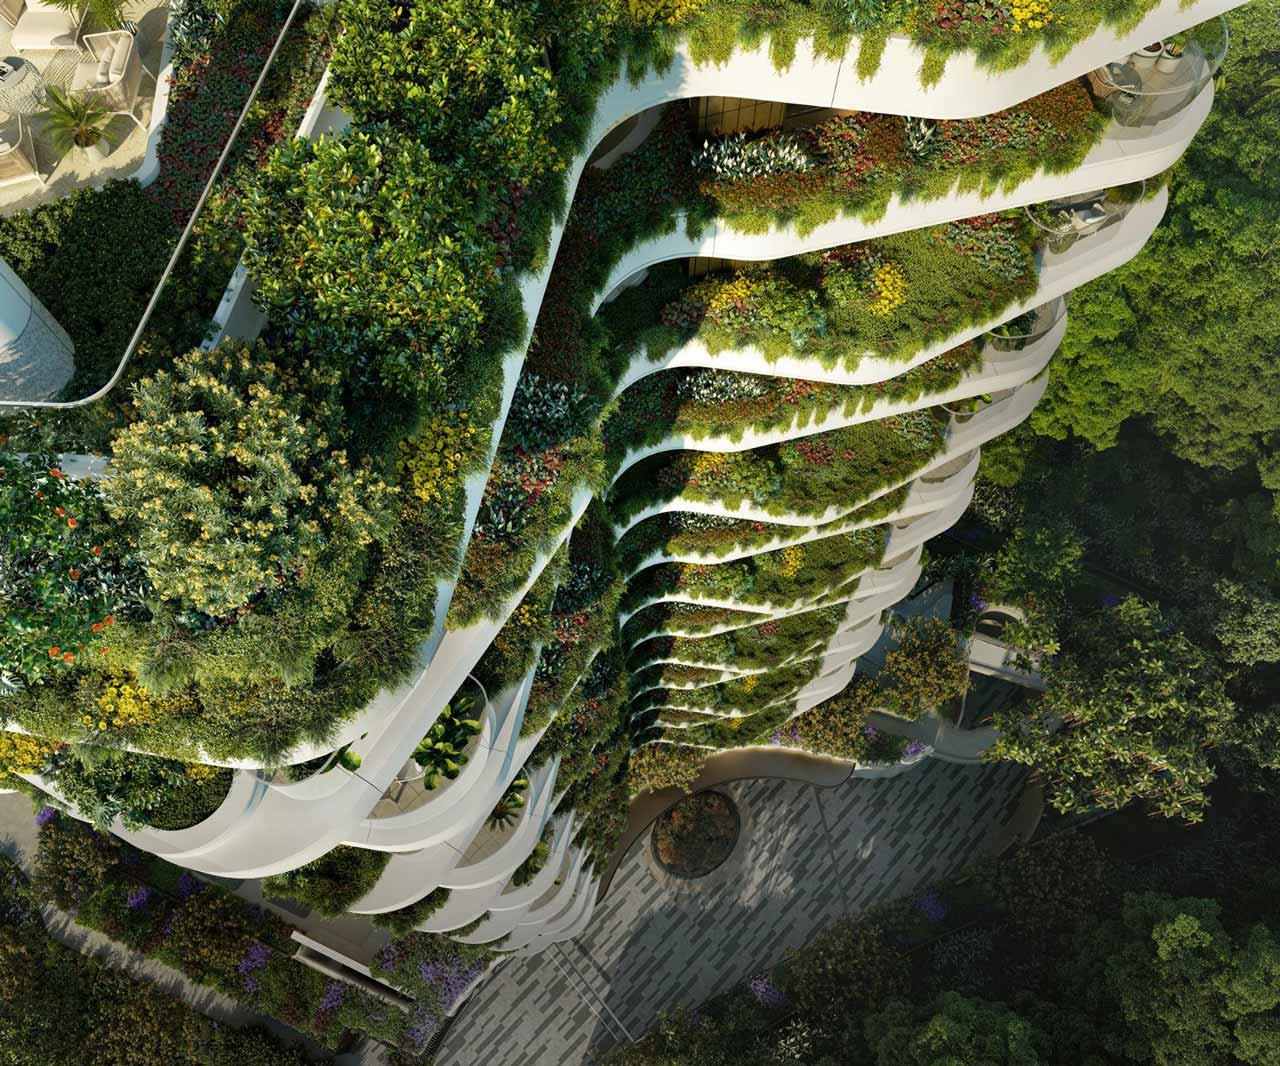 Park Nova Ultra Luxury Condo in D10 Orchard